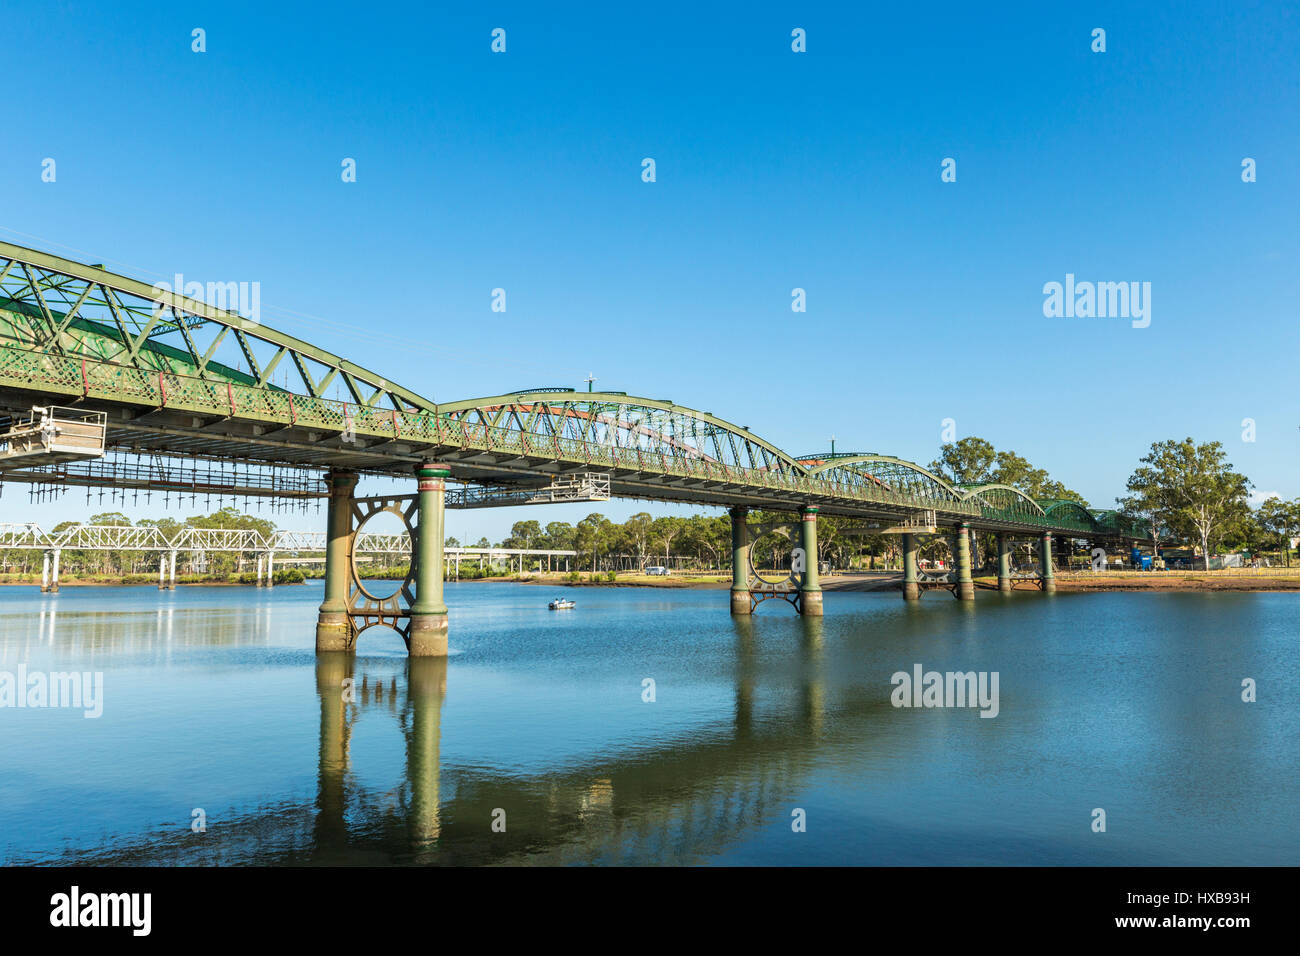 The heritage-listed Burnett Bridge.  Bundaberg, Queensland, Australia - Stock Image